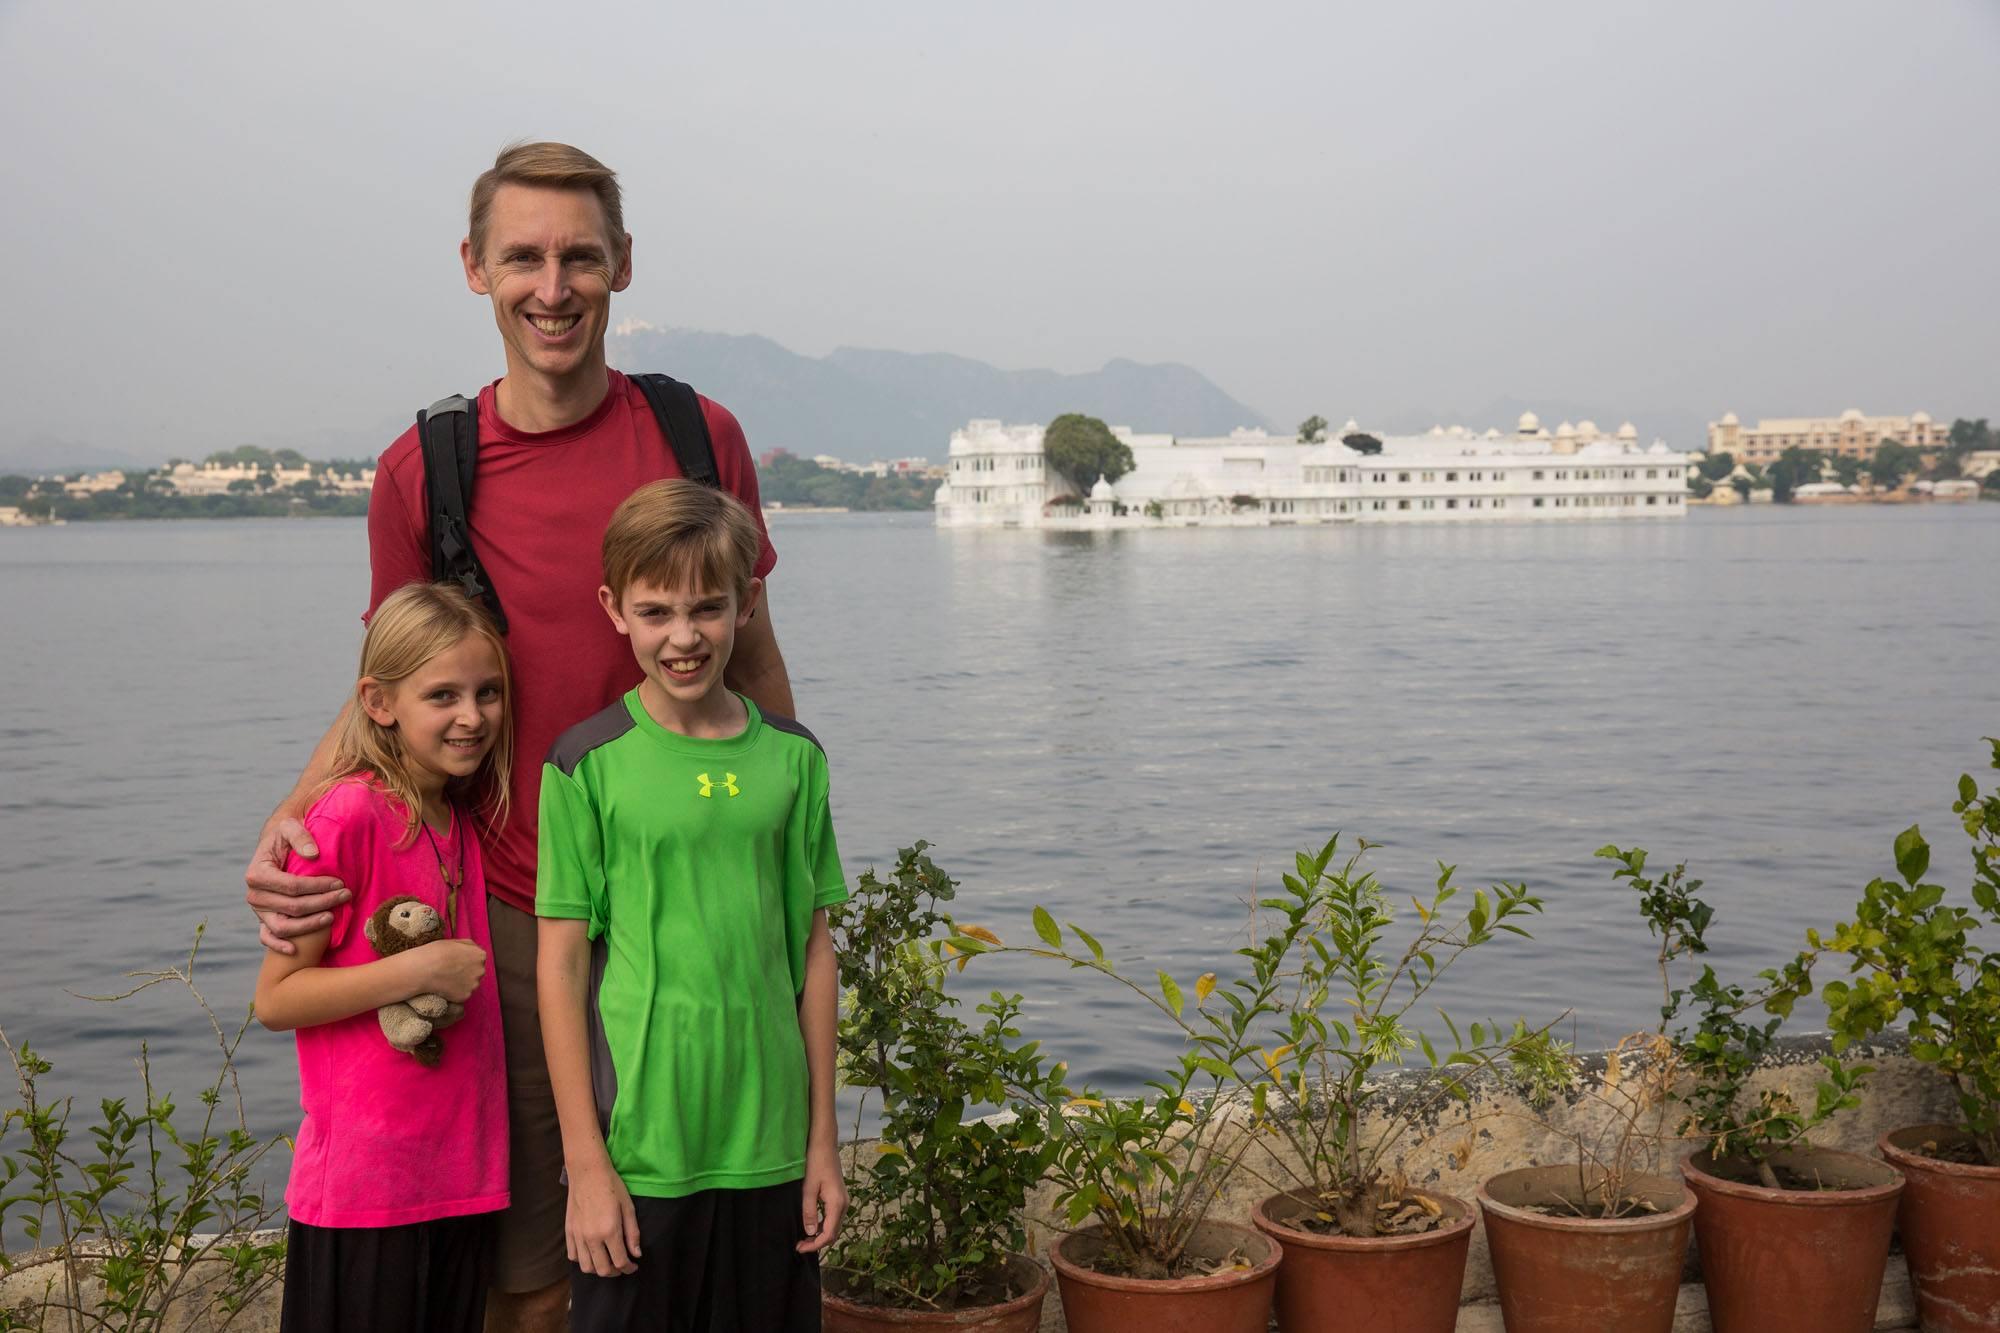 Visiting Udaipur